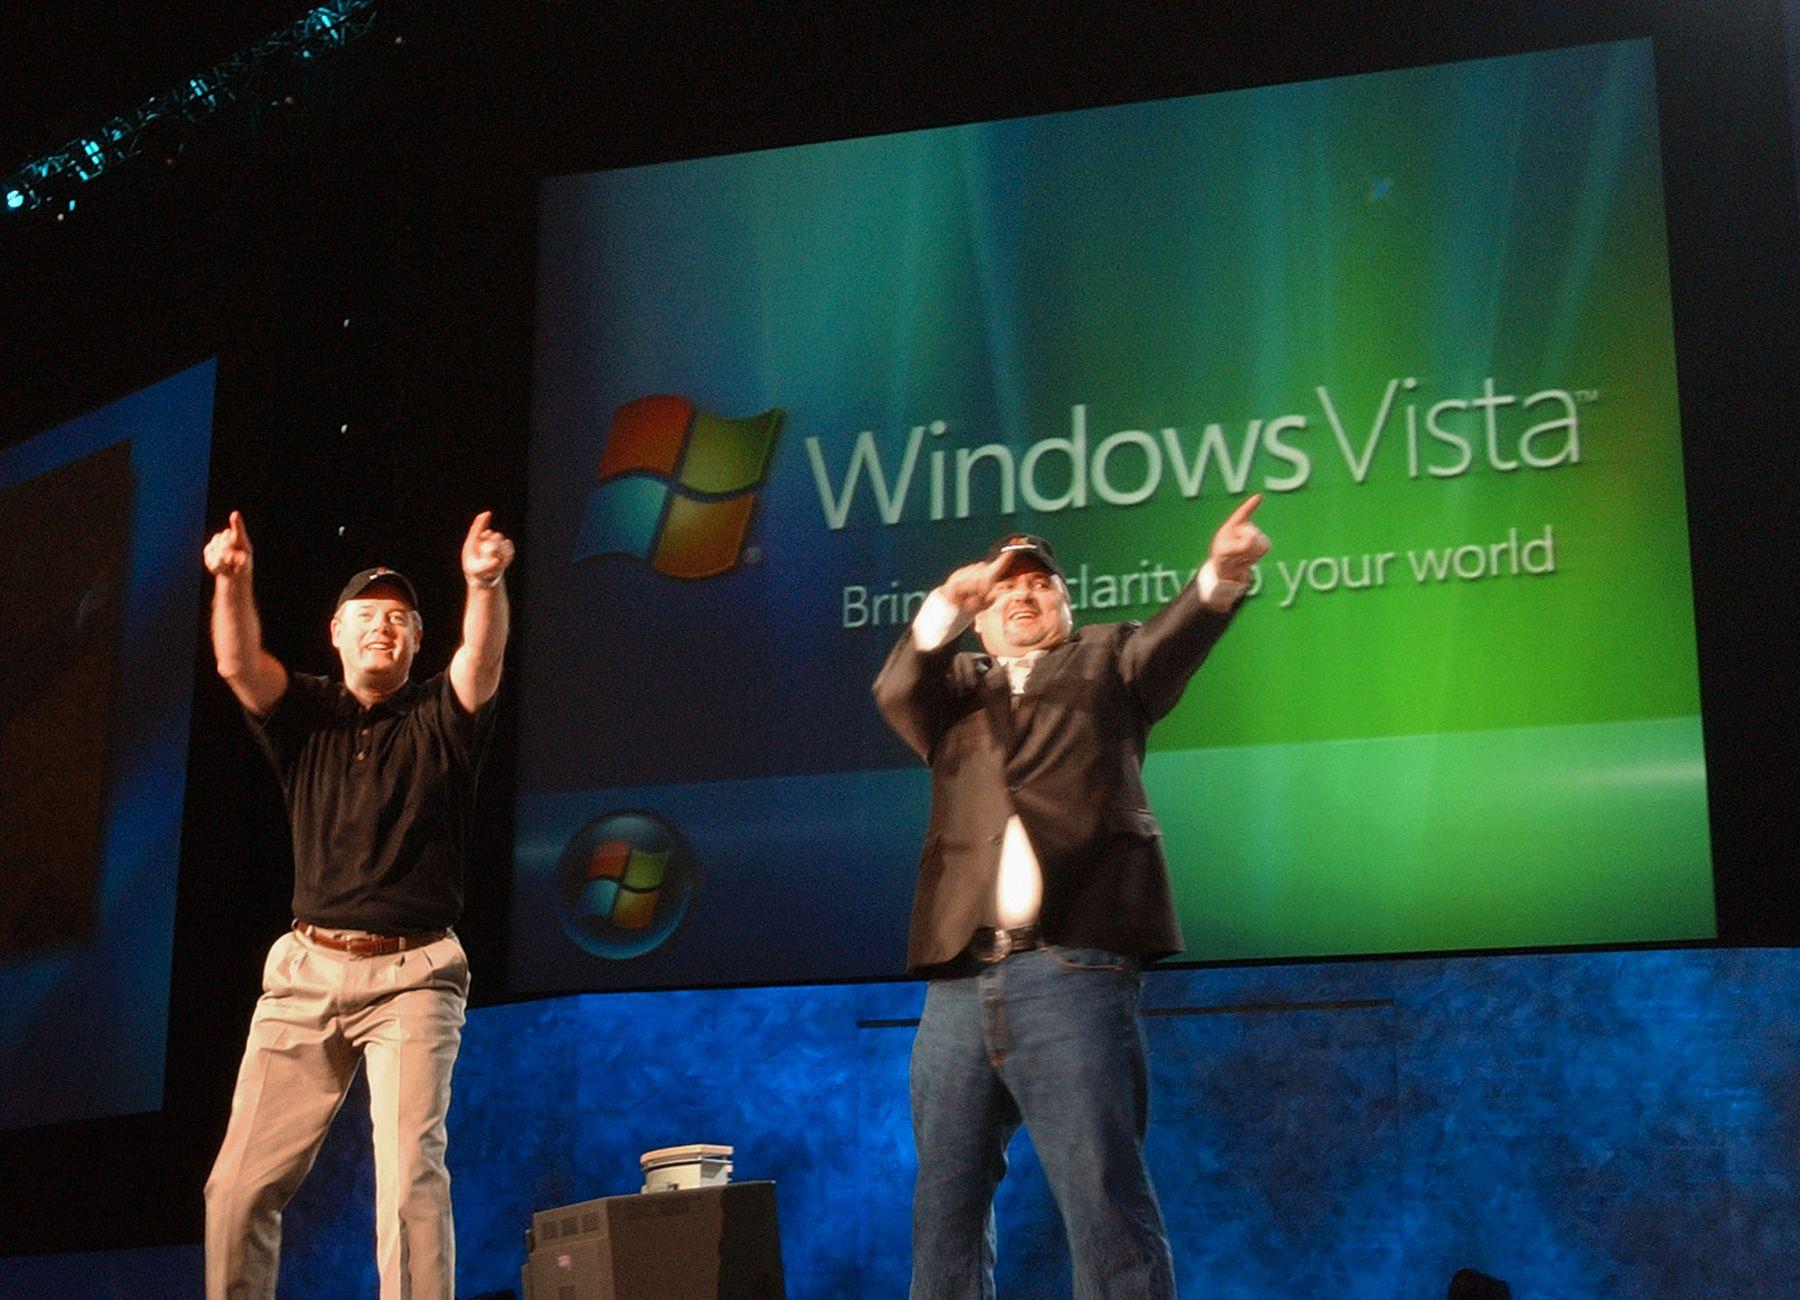 Windows Vista ga Microsoft et frynsete rykte. Her blir operativsystemet annonsert i juli 2005.Foto: Microsoft